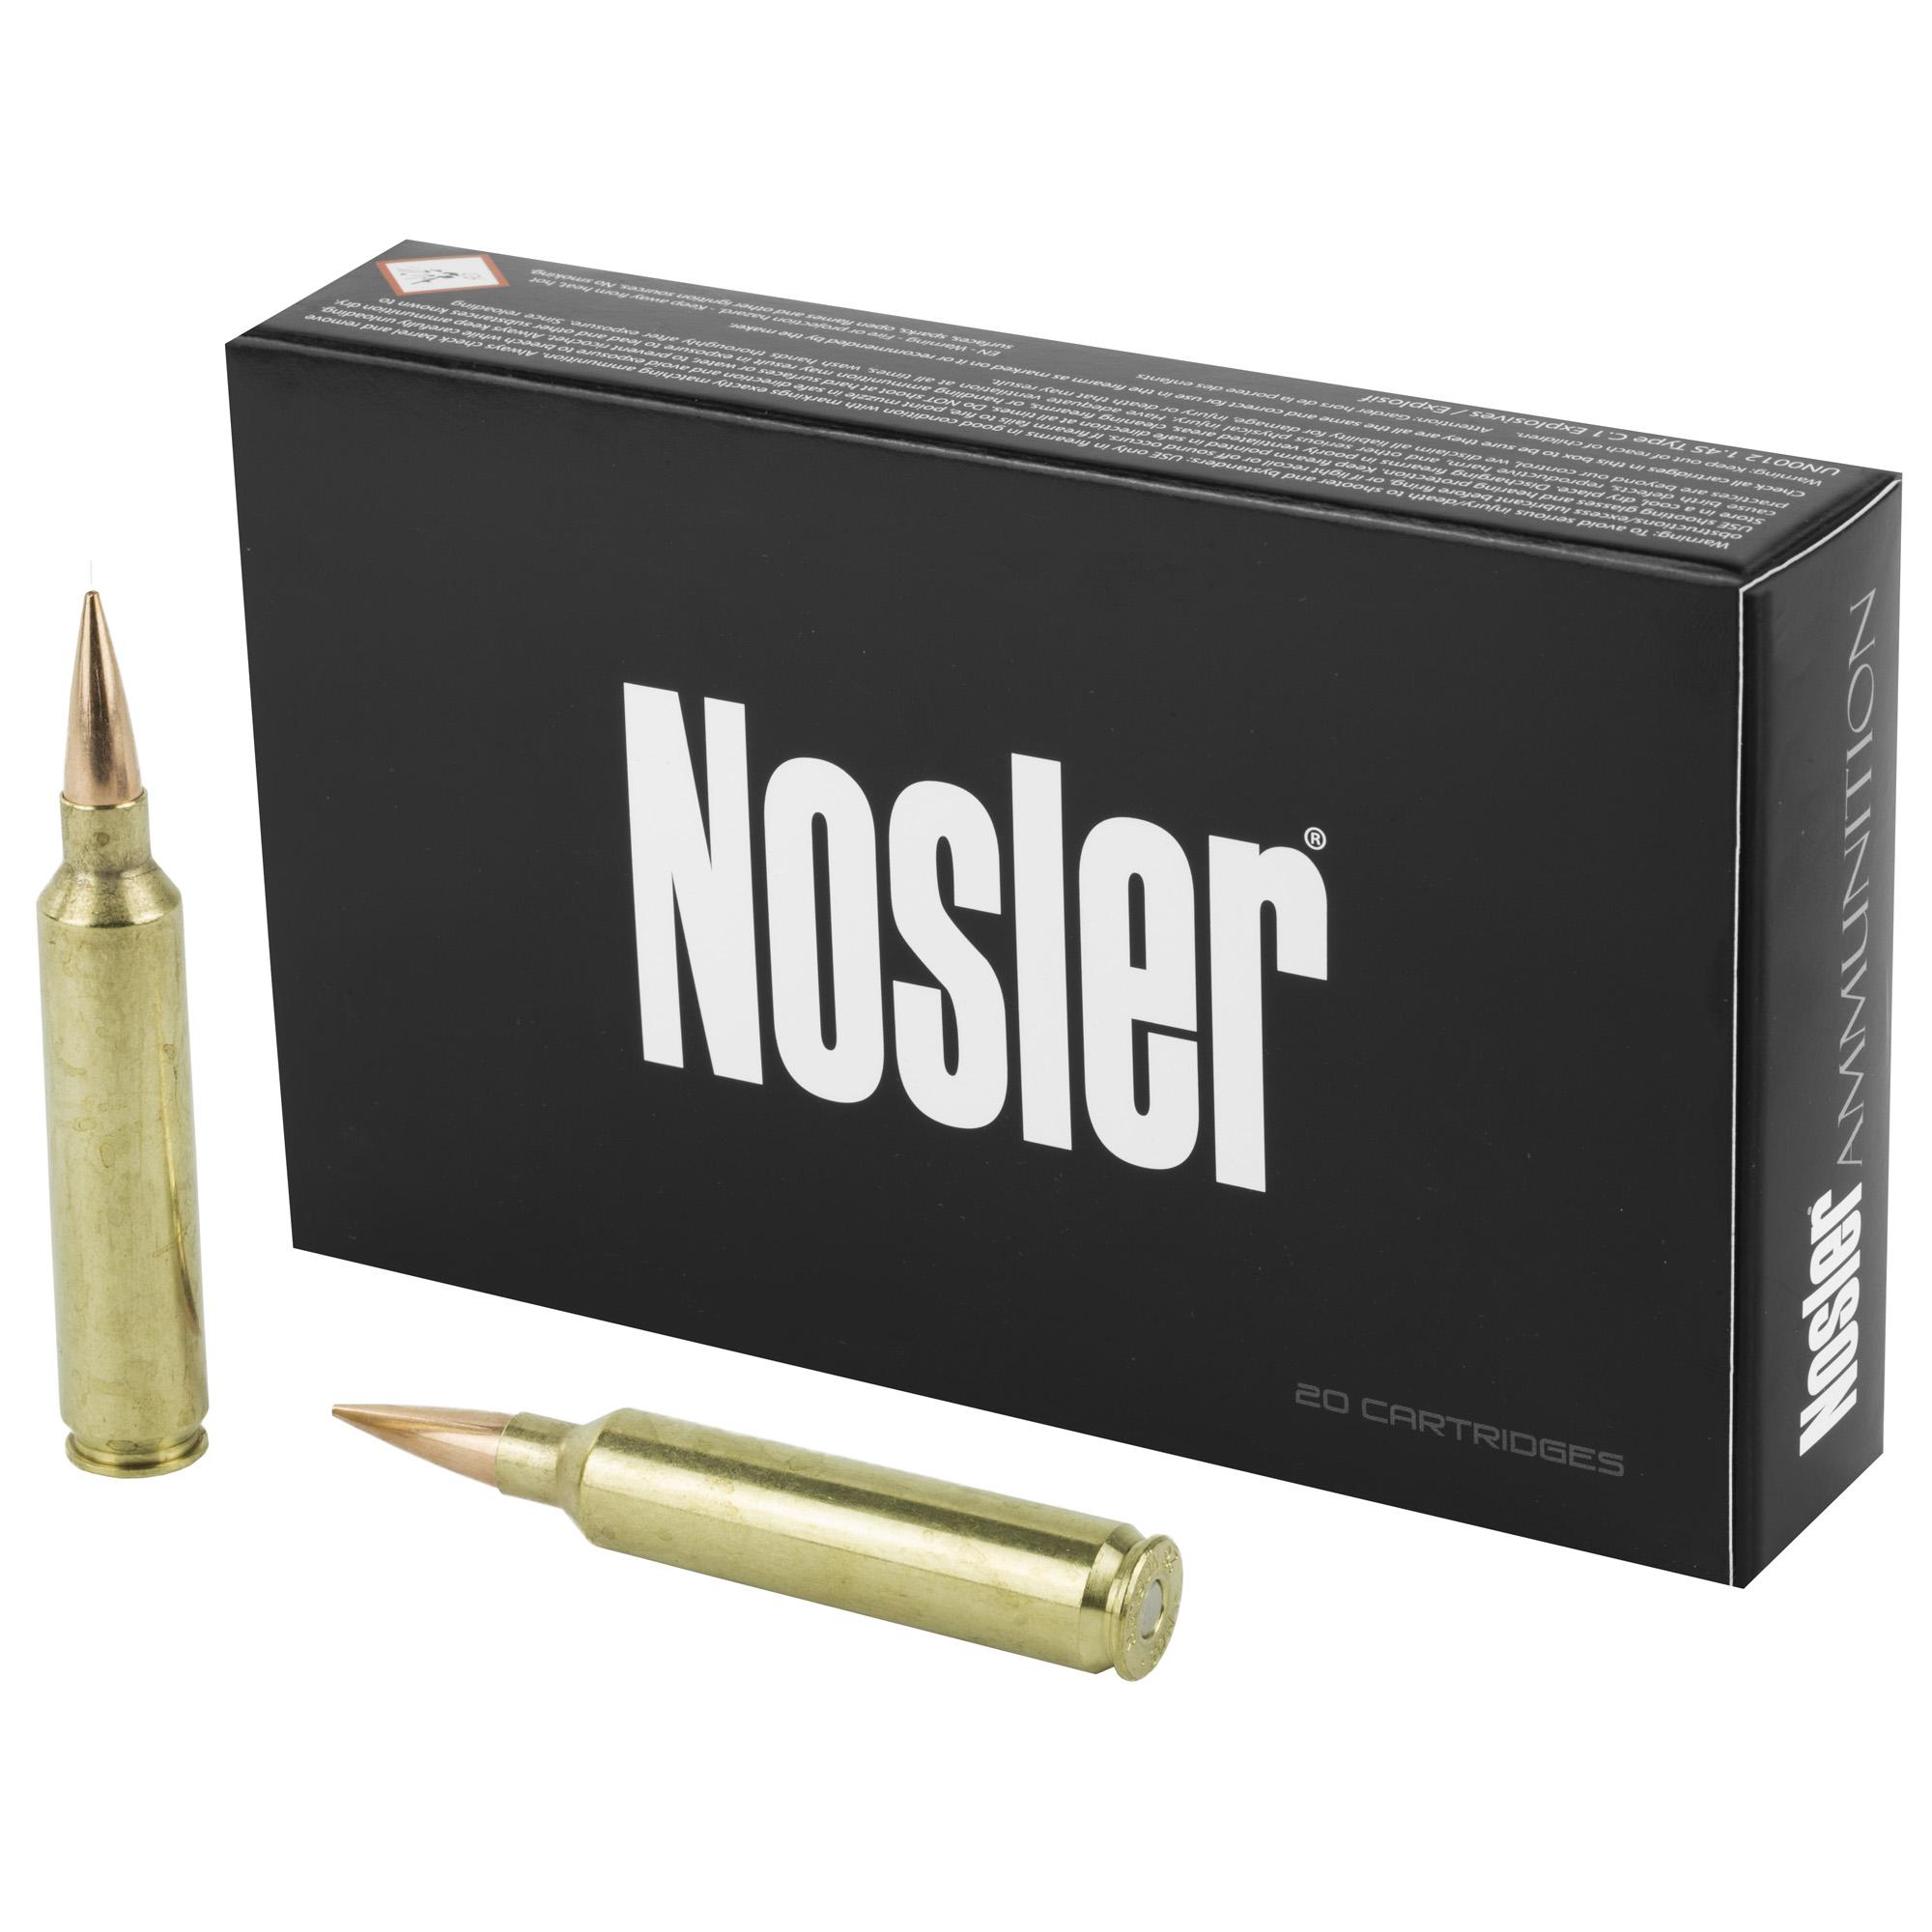 Rifle Ammo -  28 Nosler - 2A Warehouse